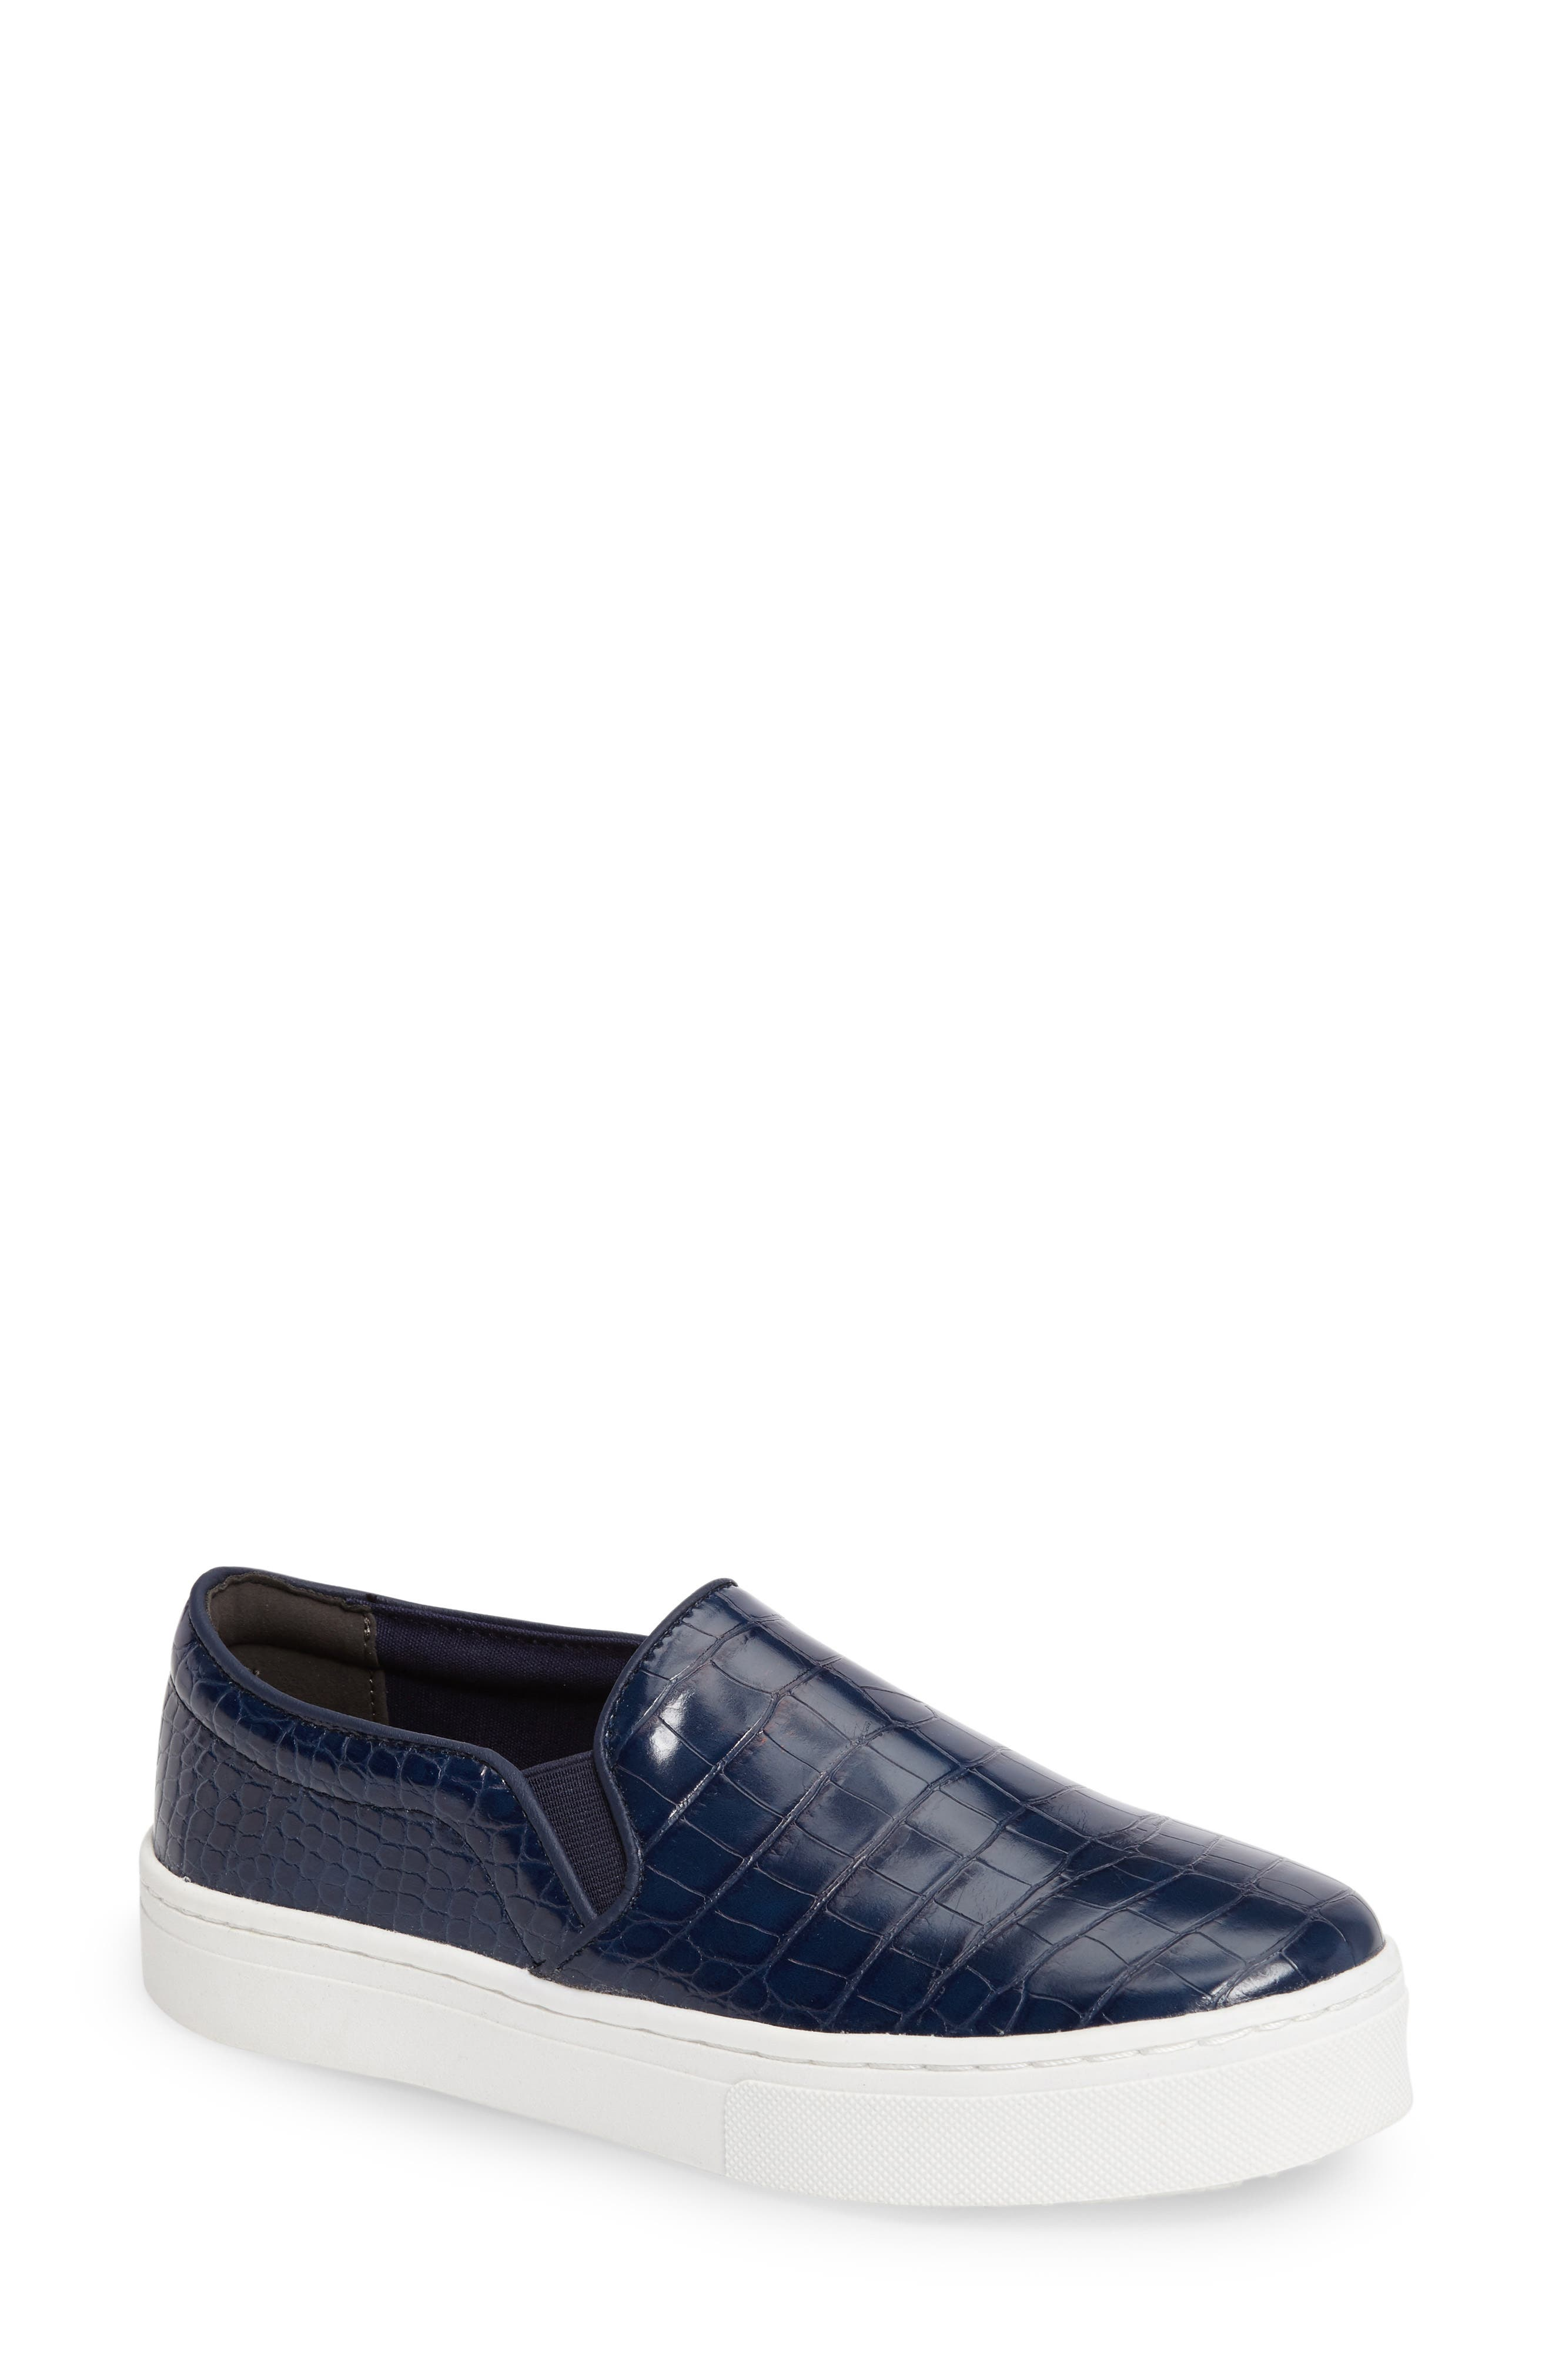 Main Image - Sam Edelman Lacey Slip-On Platform Sneaker (Women)